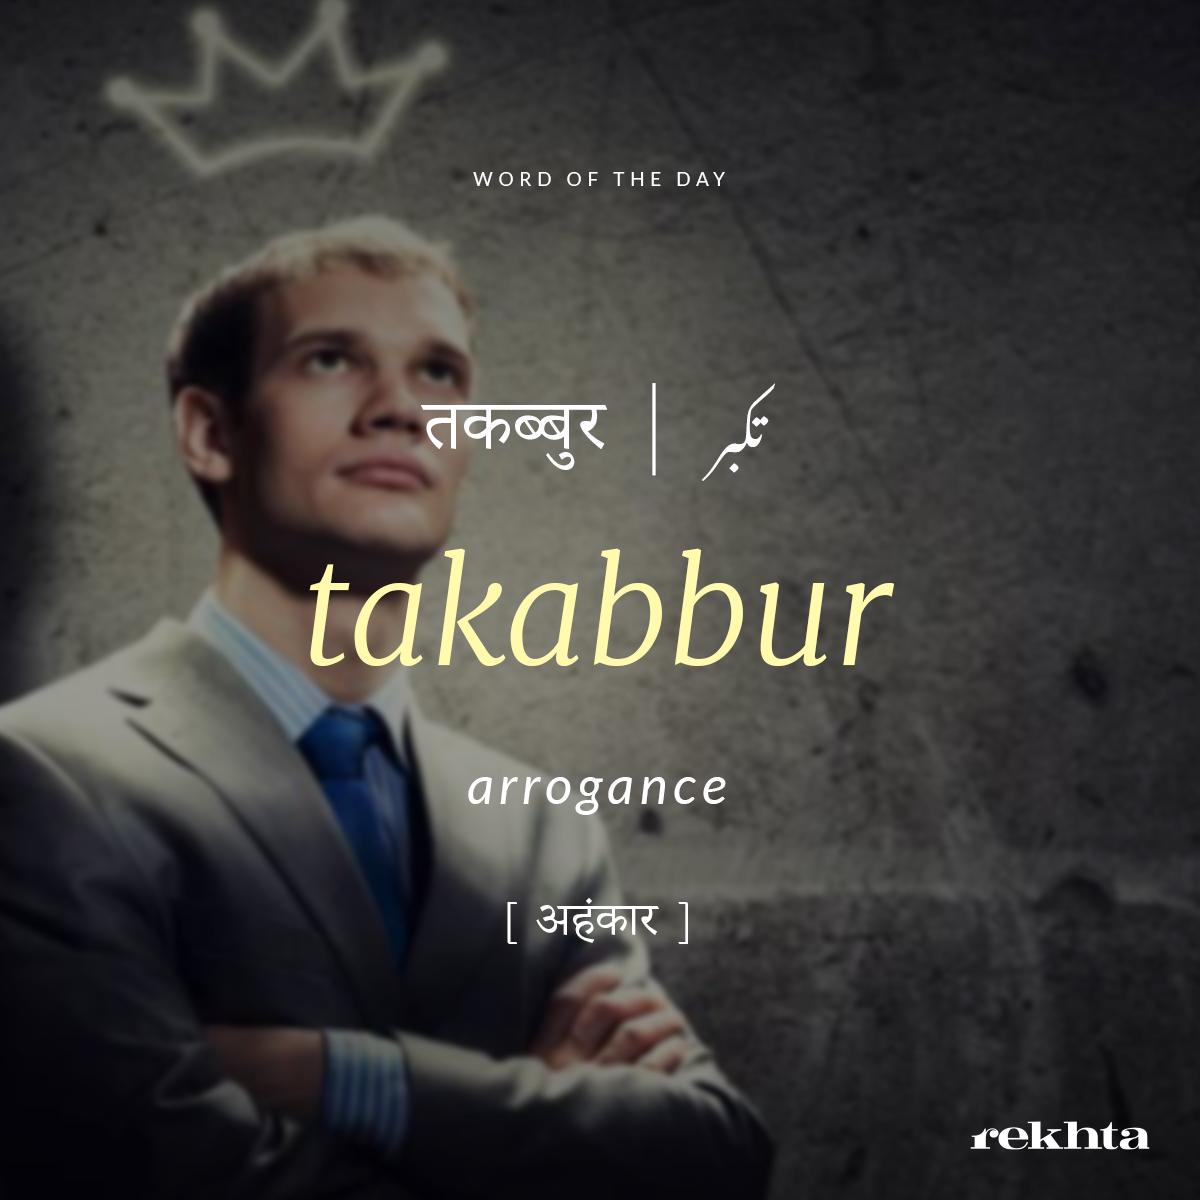 wordcollection #meaning #translate #singleword #words | Urdu/ arbi